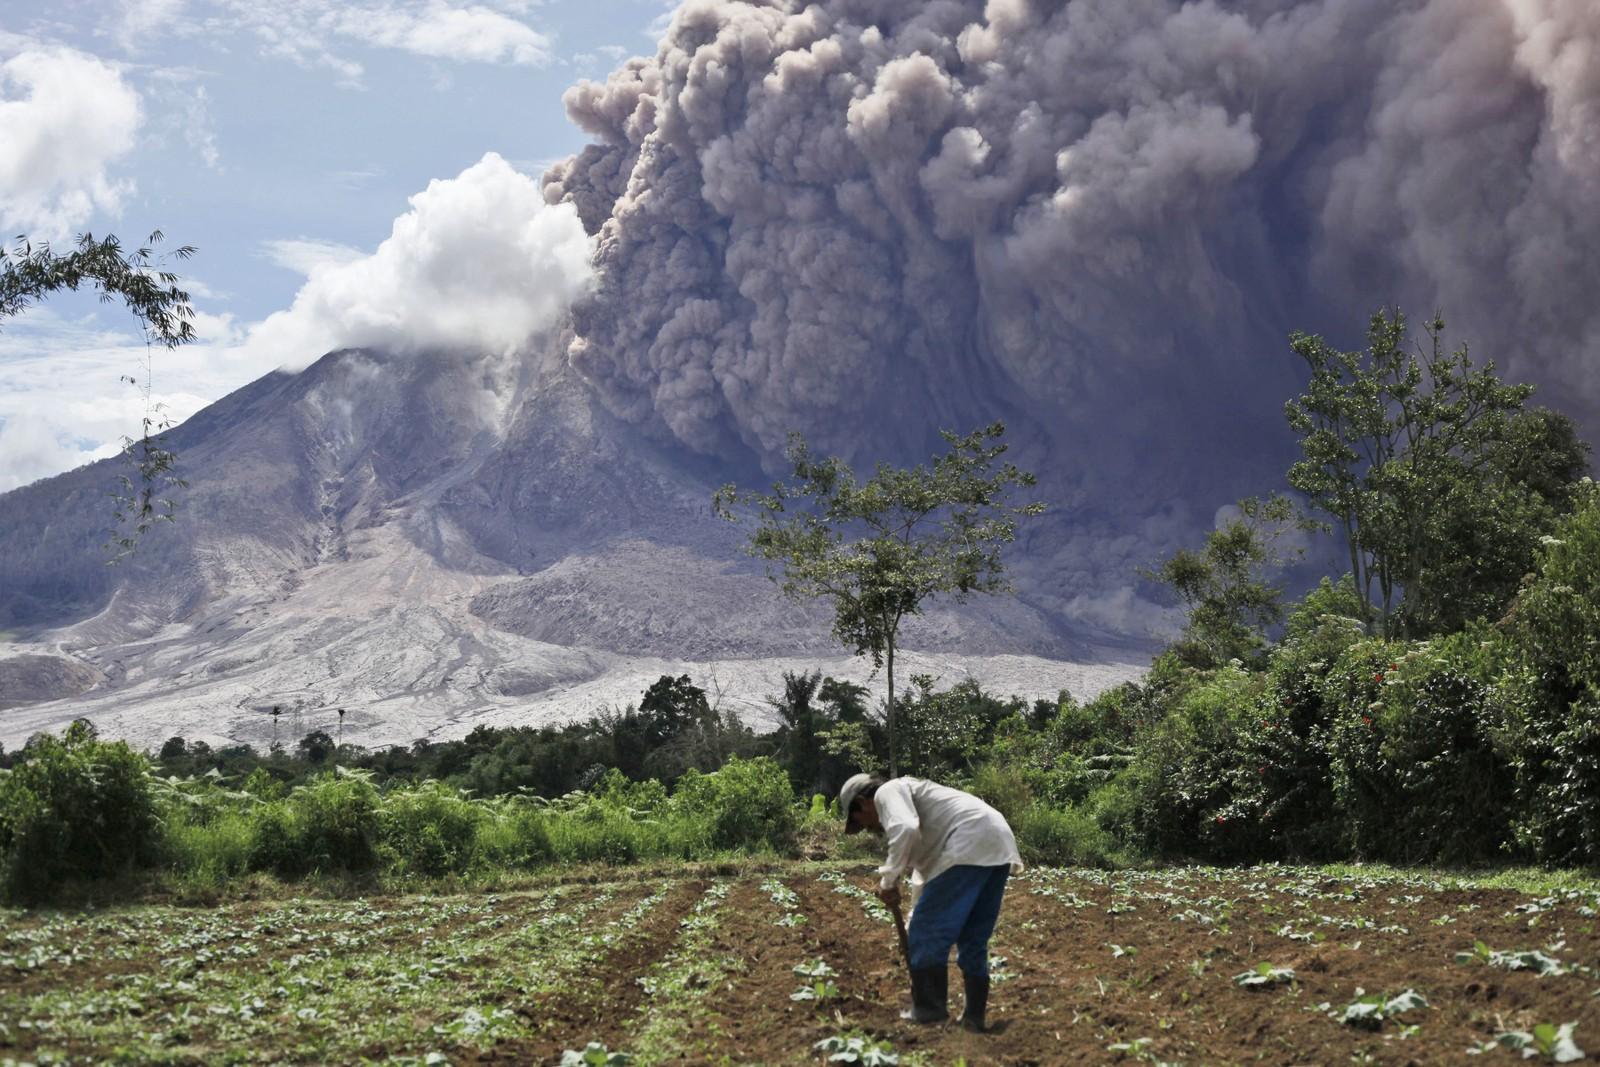 Livet går videre trass en truende askesky. Vulkanen har sporadisk spydd aske siden 2010. Før det har den holdt seg rolig i 400 år.